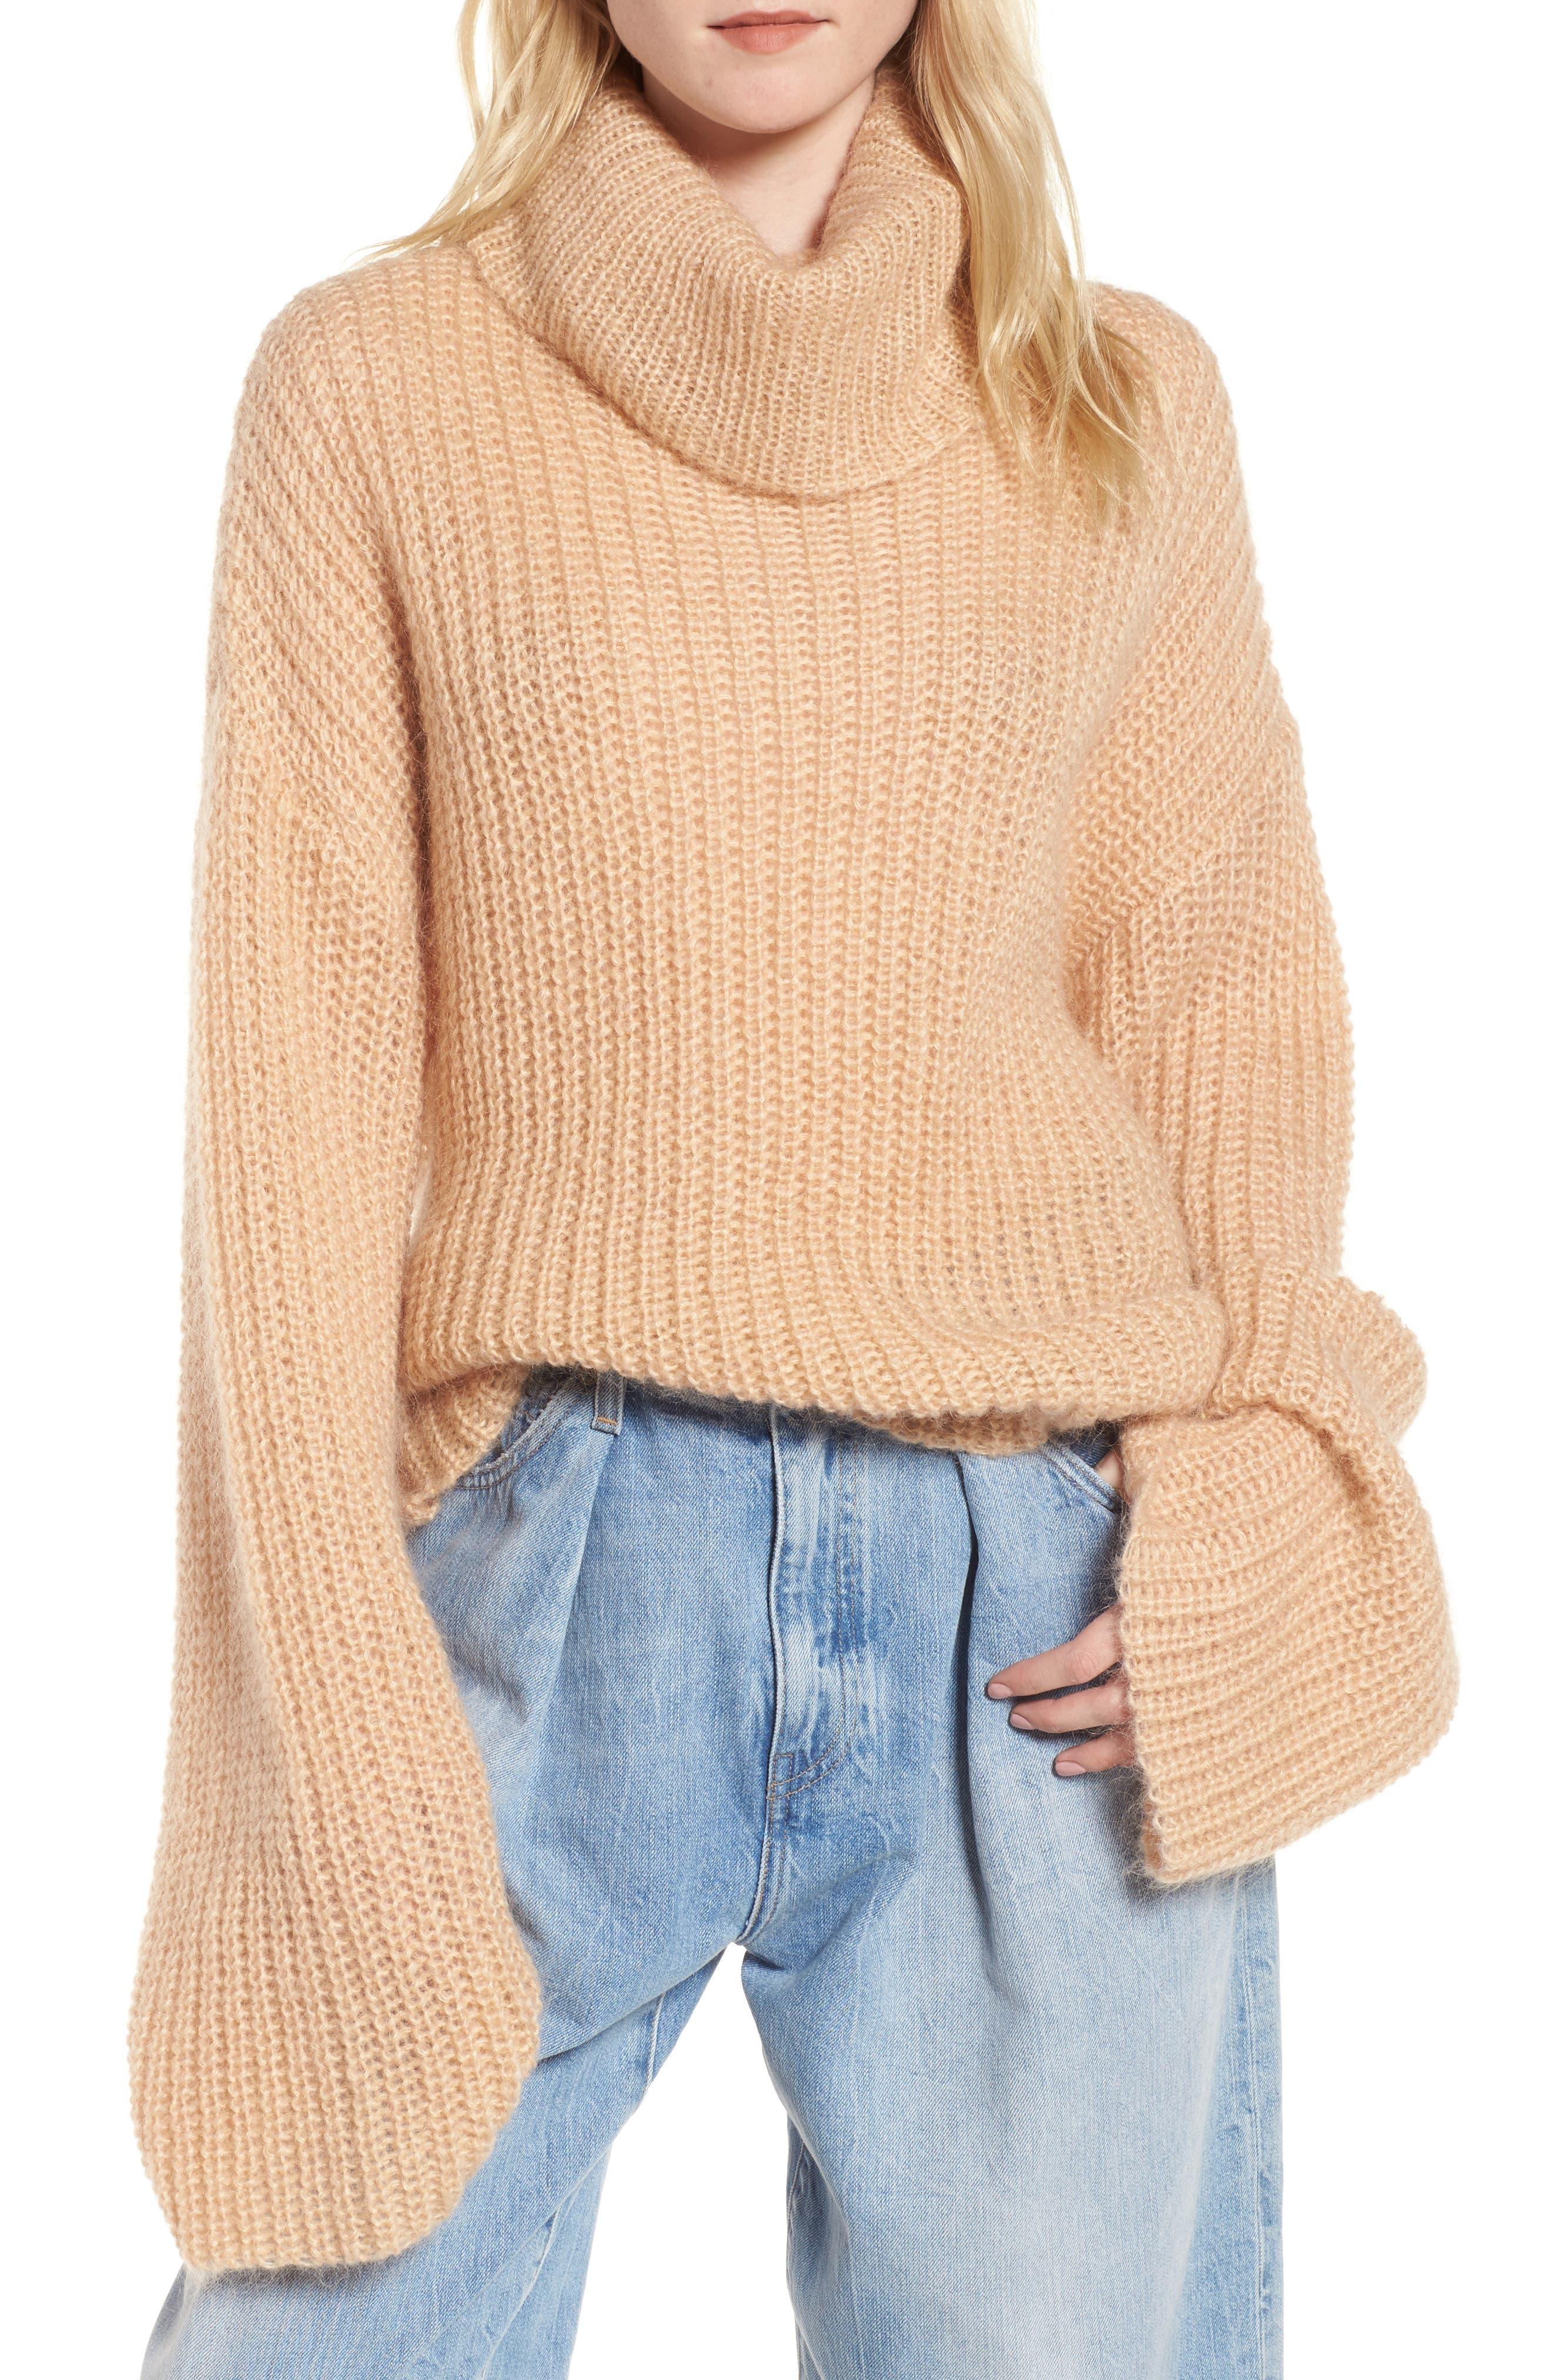 Cross Back Turtleneck Sweater,                             Main thumbnail 1, color,                             250